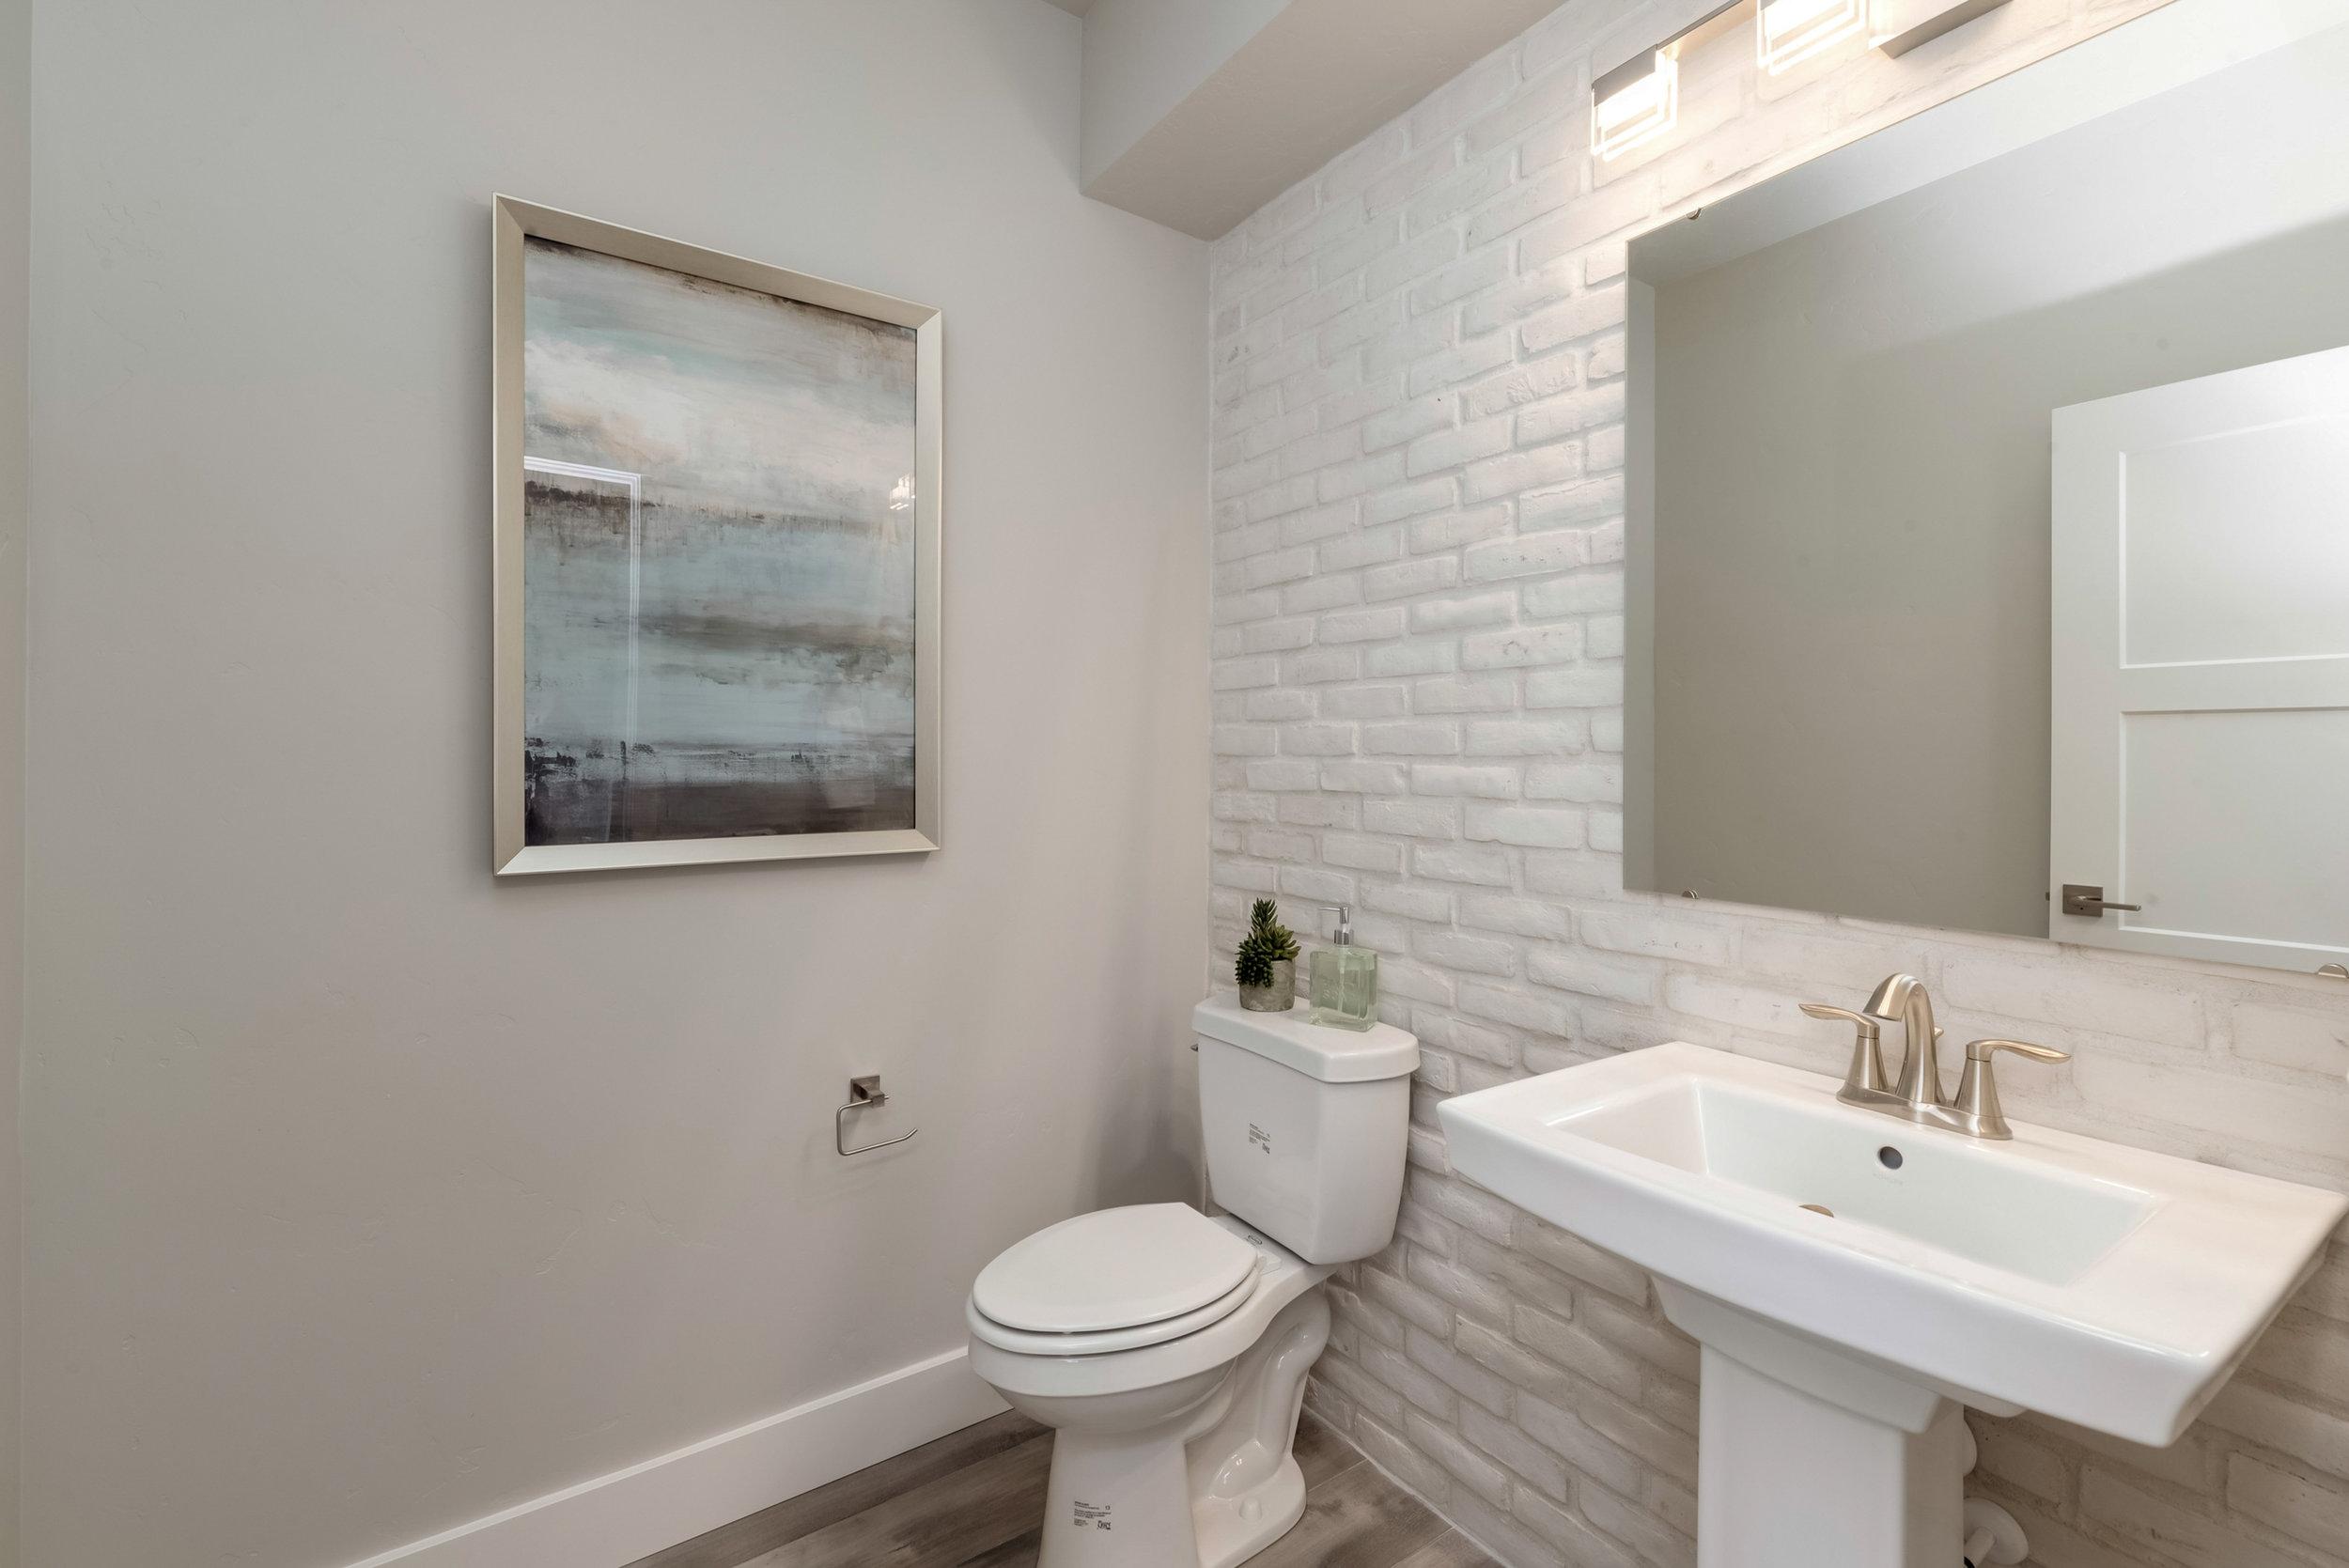 26-Bathroom.jpg